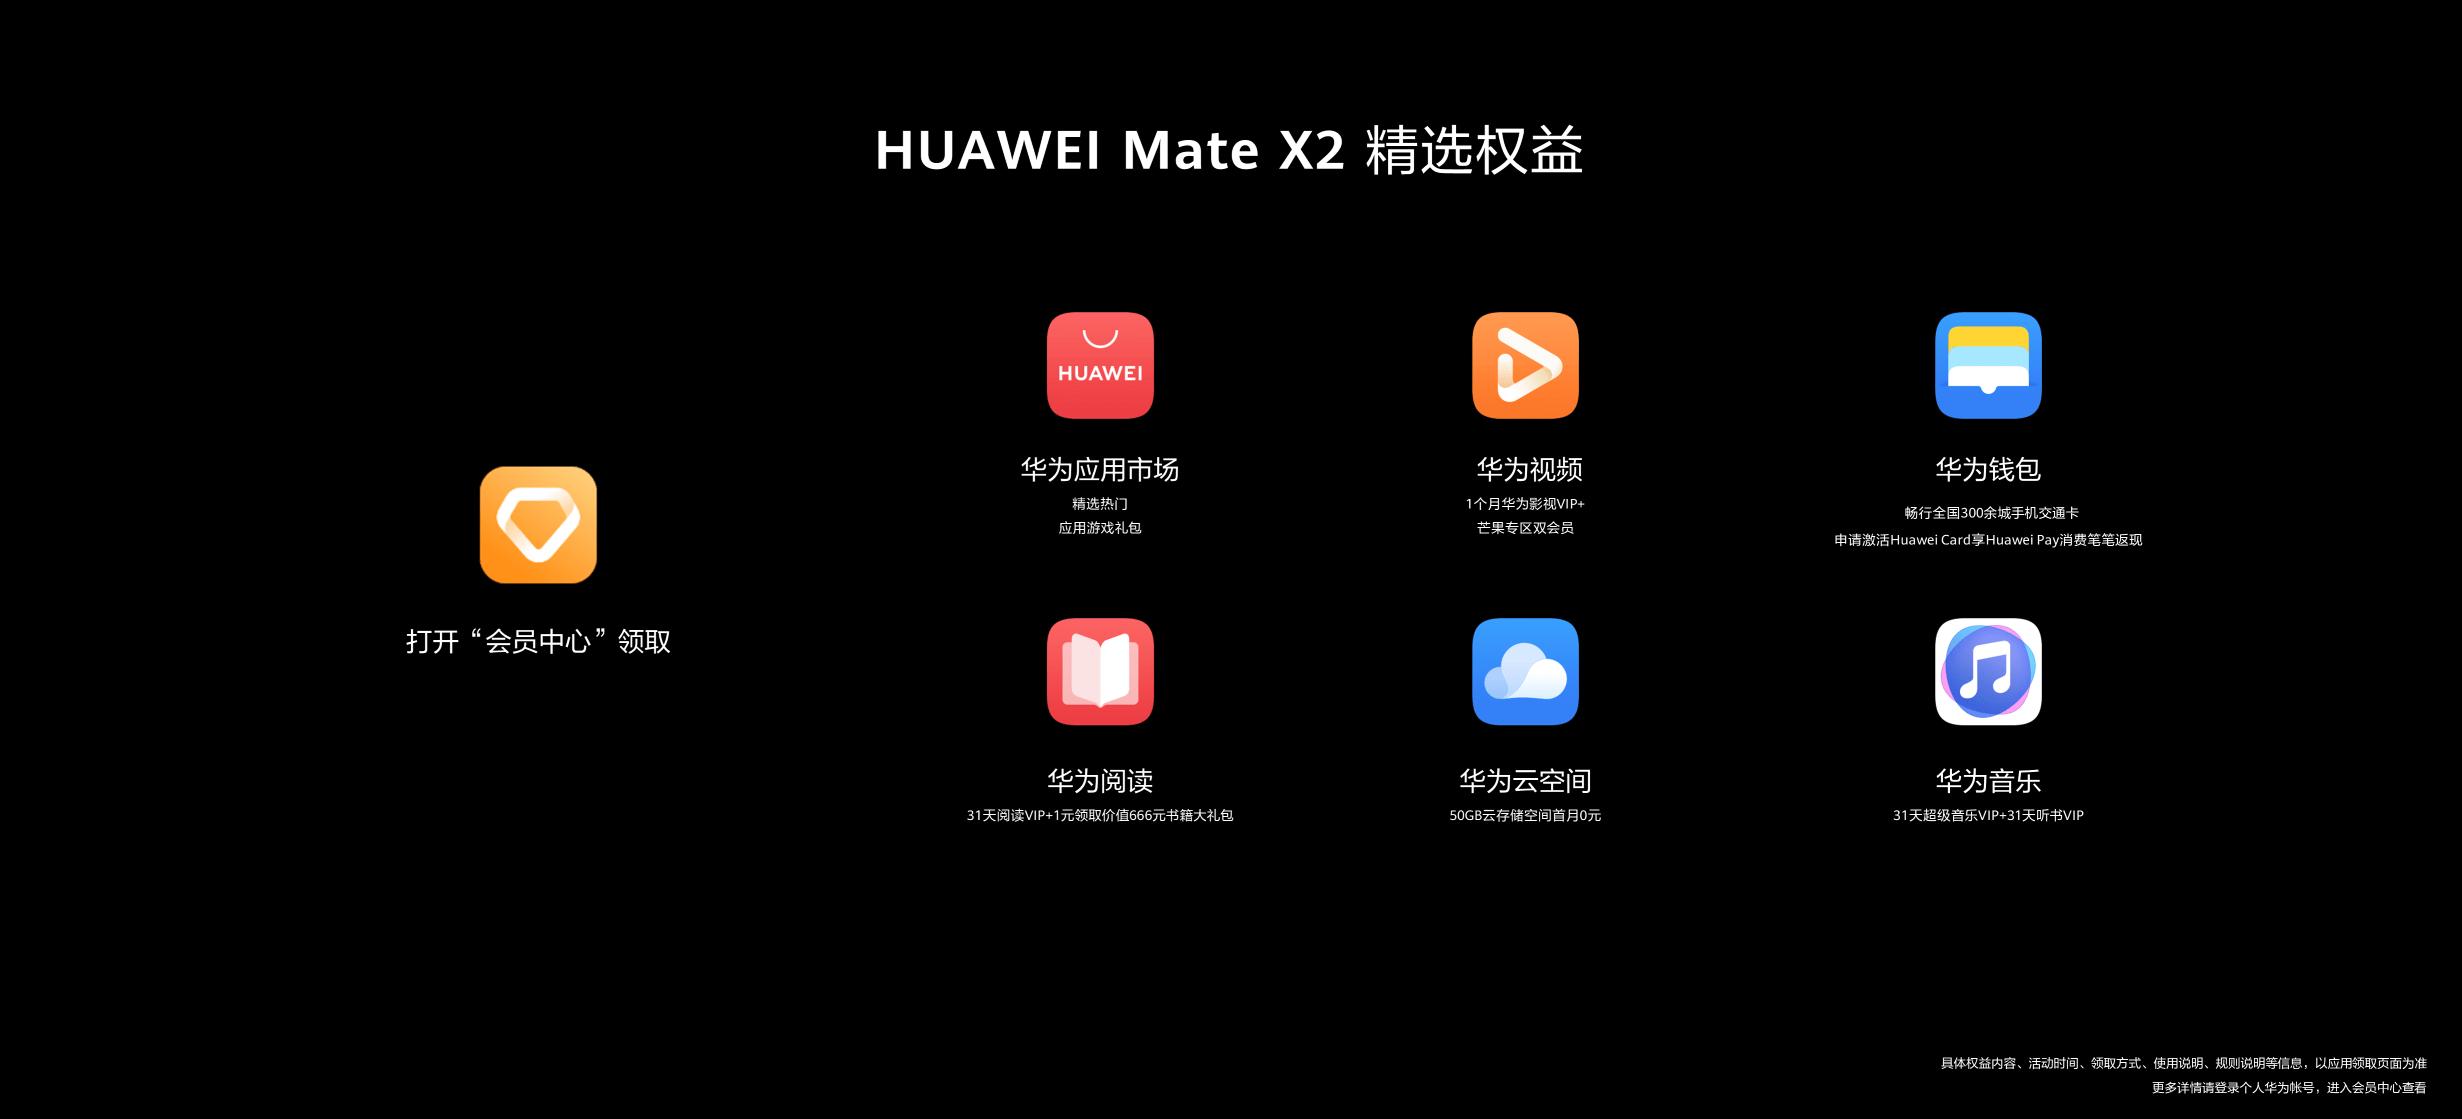 HUAWEI Mate X2发布,智慧云服务体验大展想象